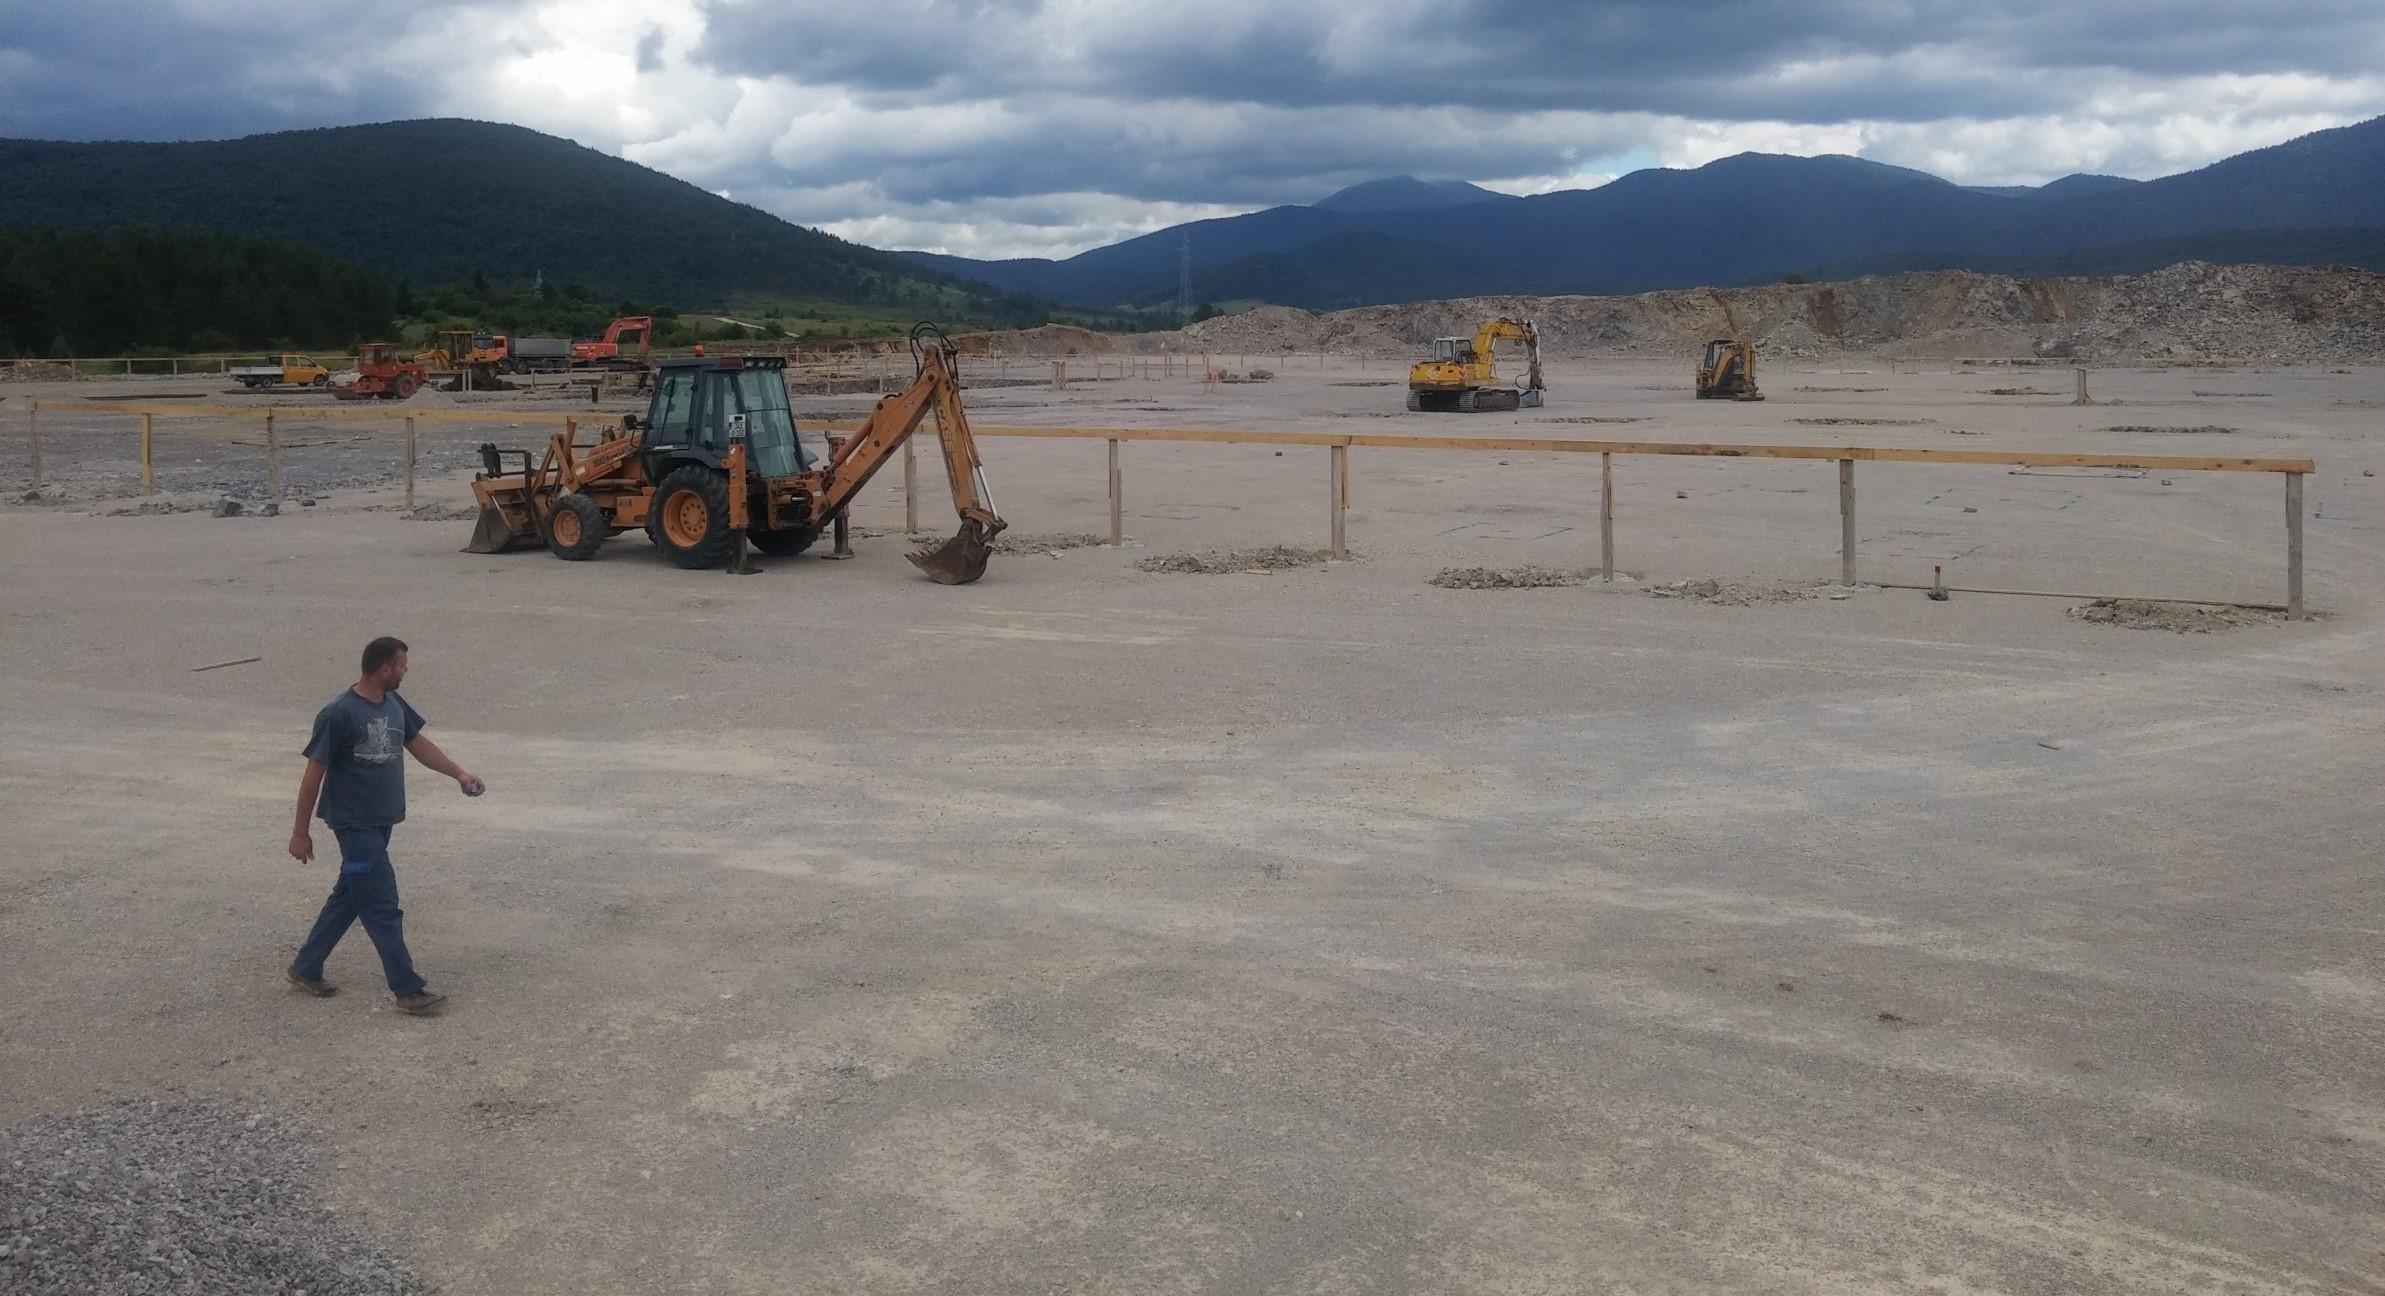 Izgradnja nove proizvodne hale za Pirnar d.o.o. Bos. Petrovac